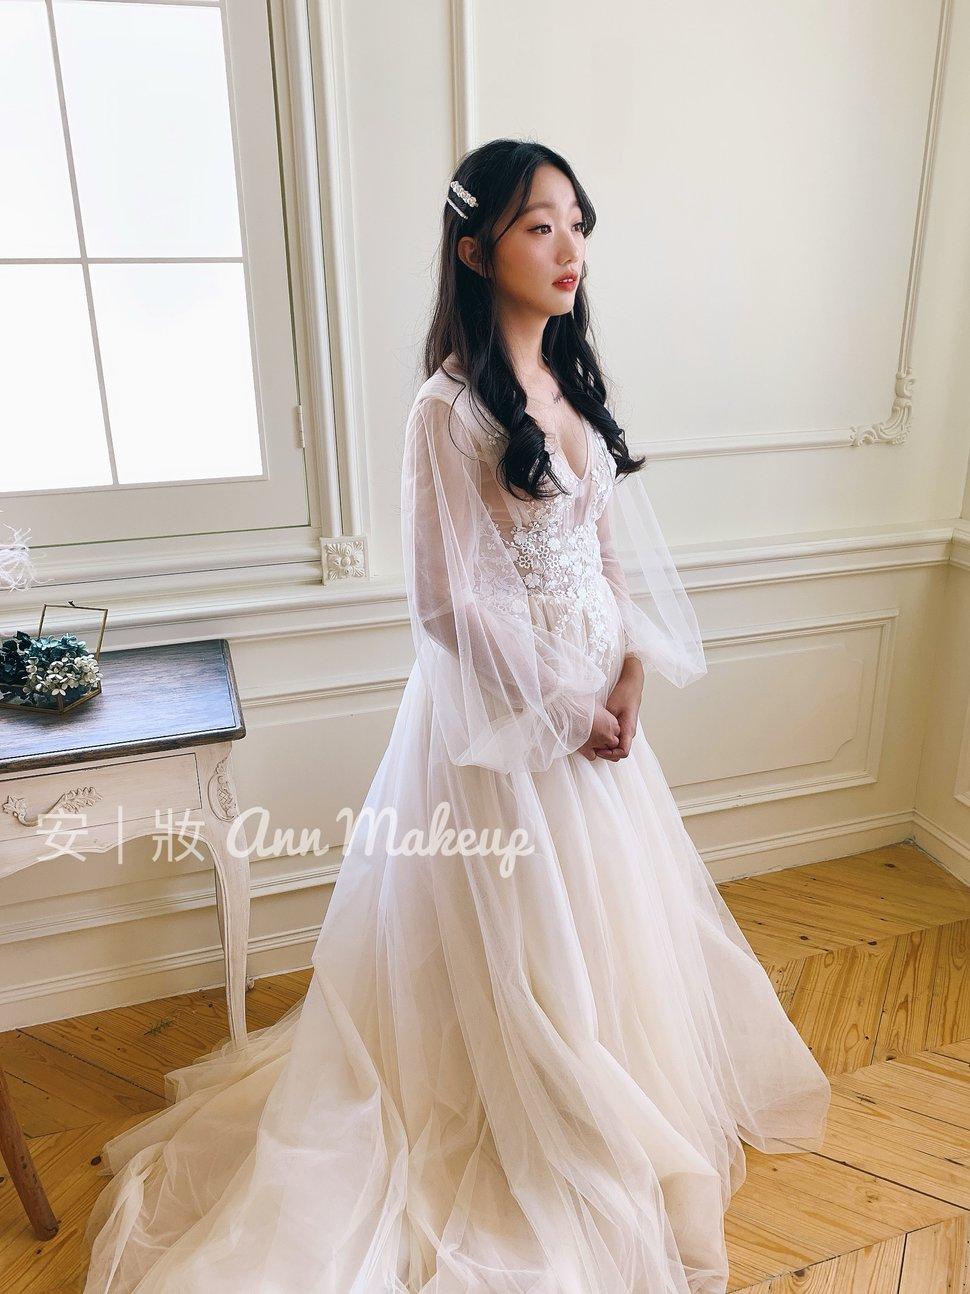 20190717_Snapseed - 安妝 Ann Makeup《結婚吧》